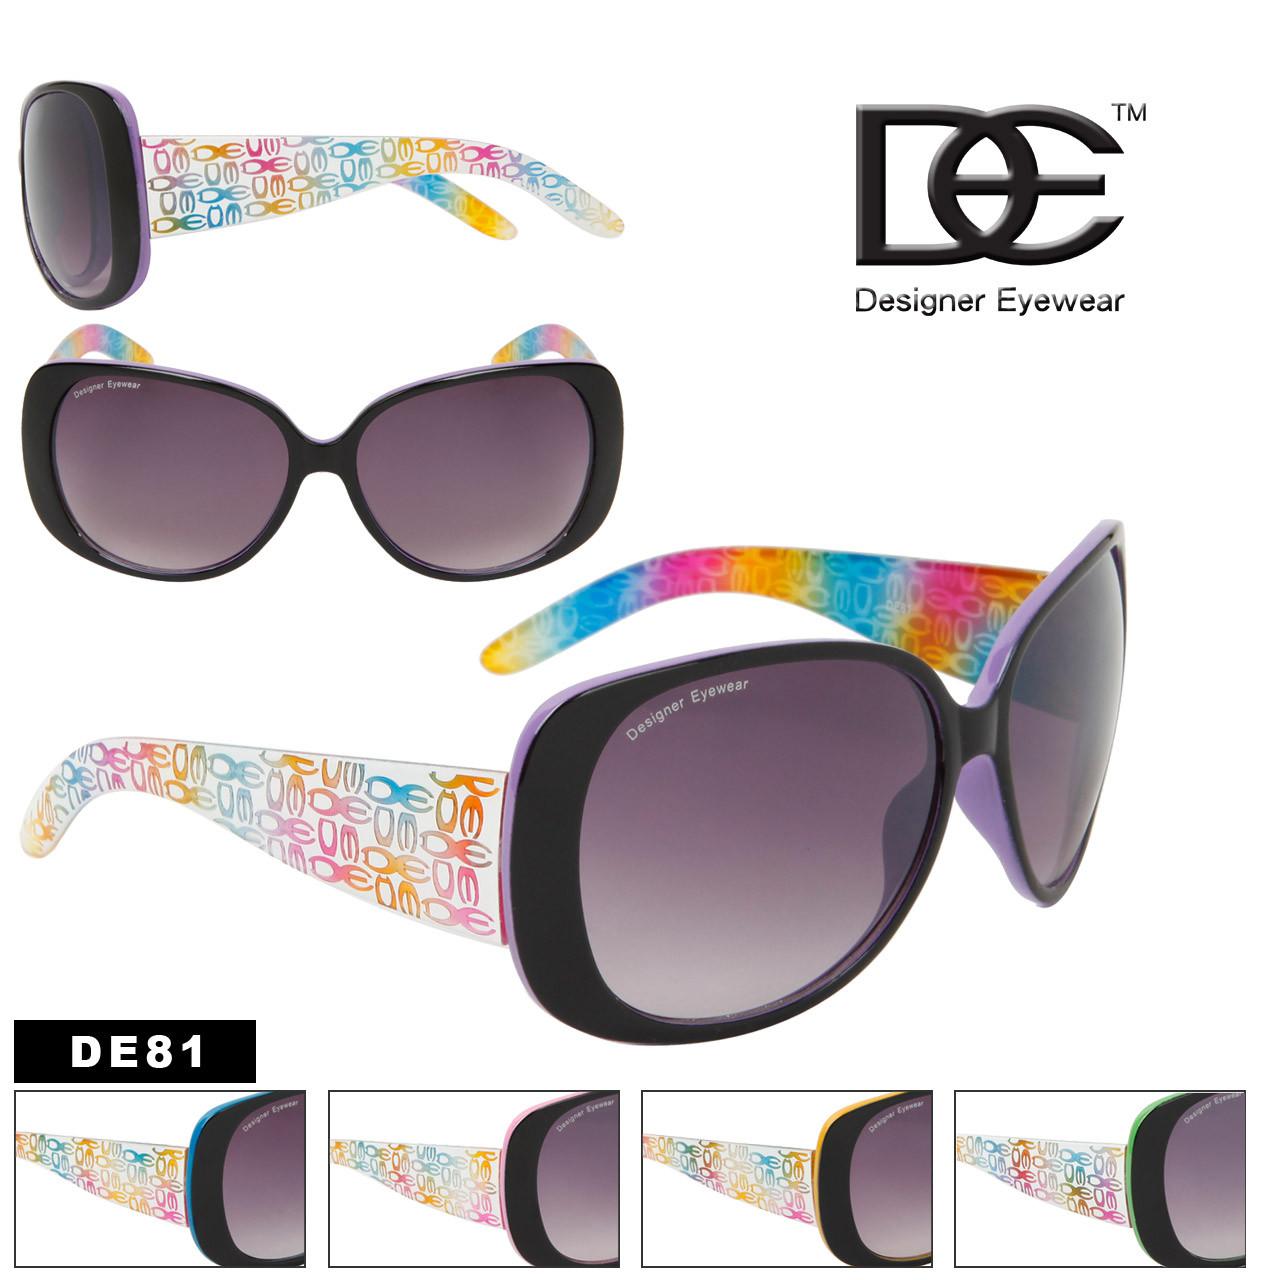 Women's Fashion Sunglasses DE81